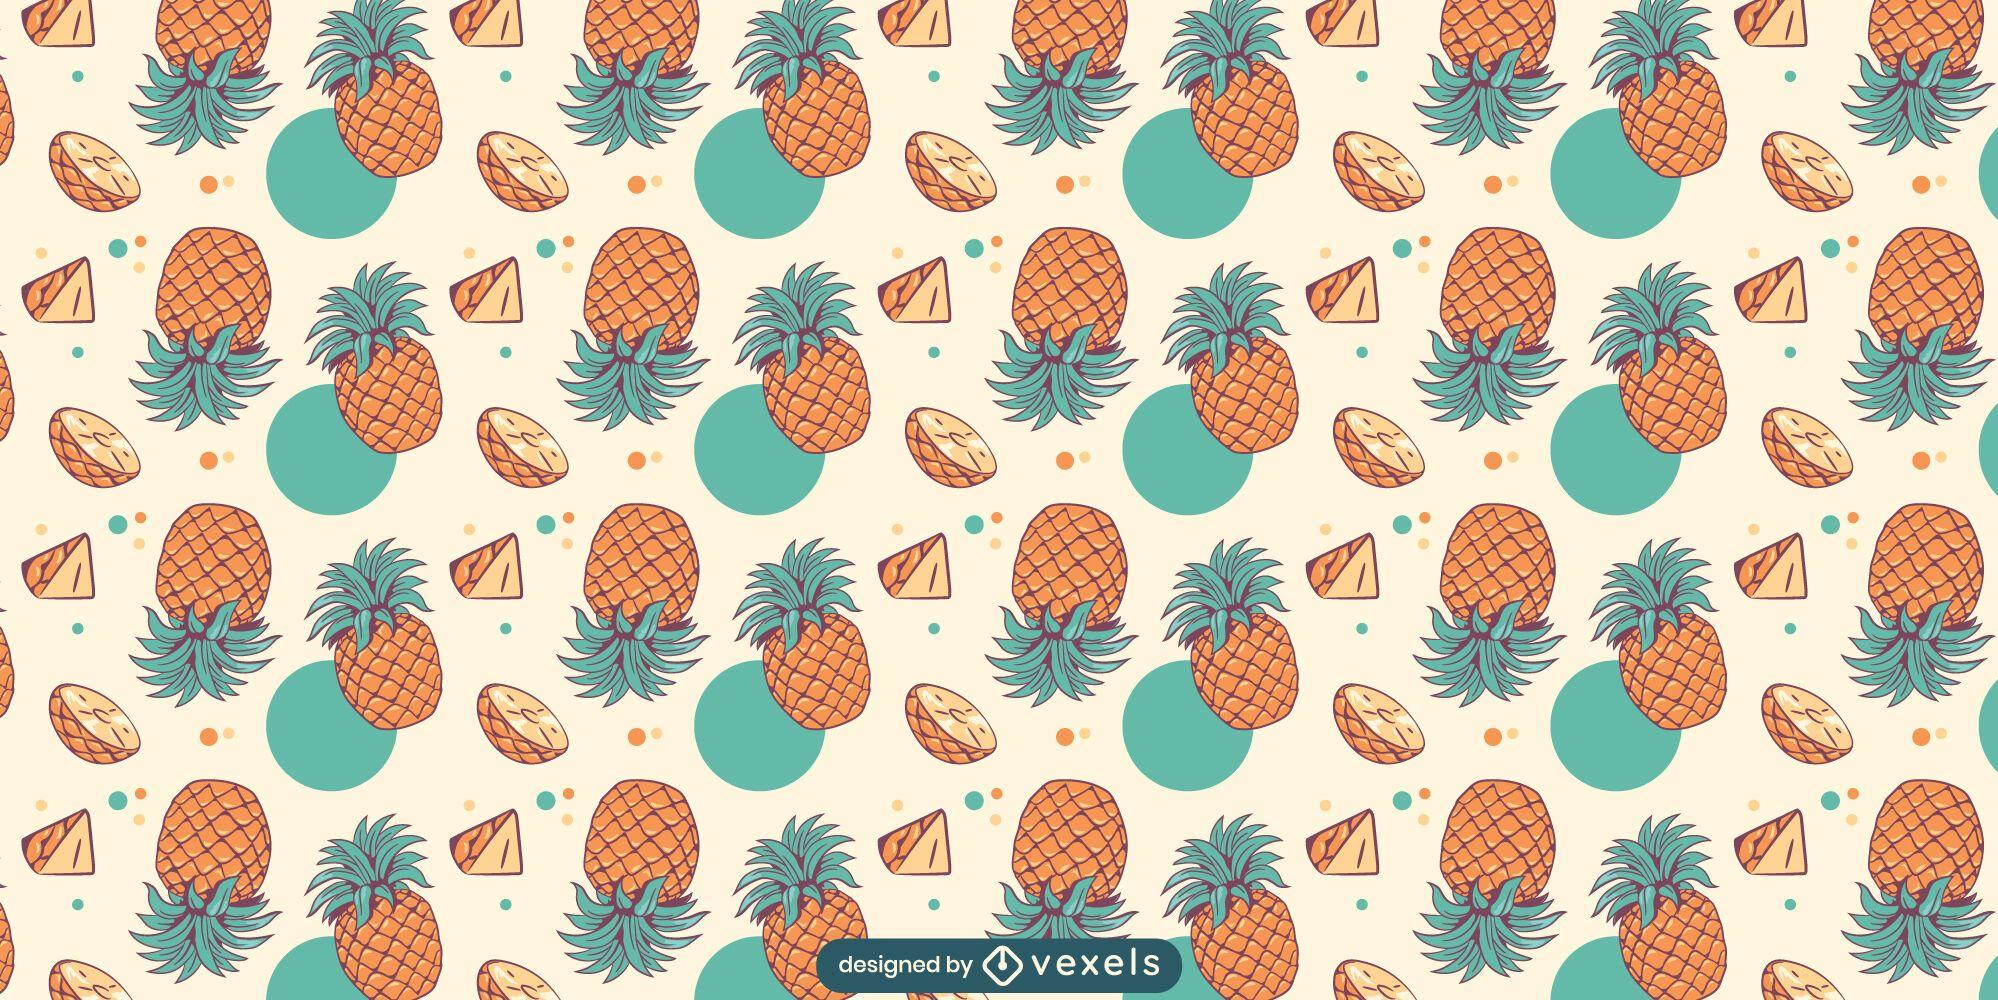 Pineapples pattern design